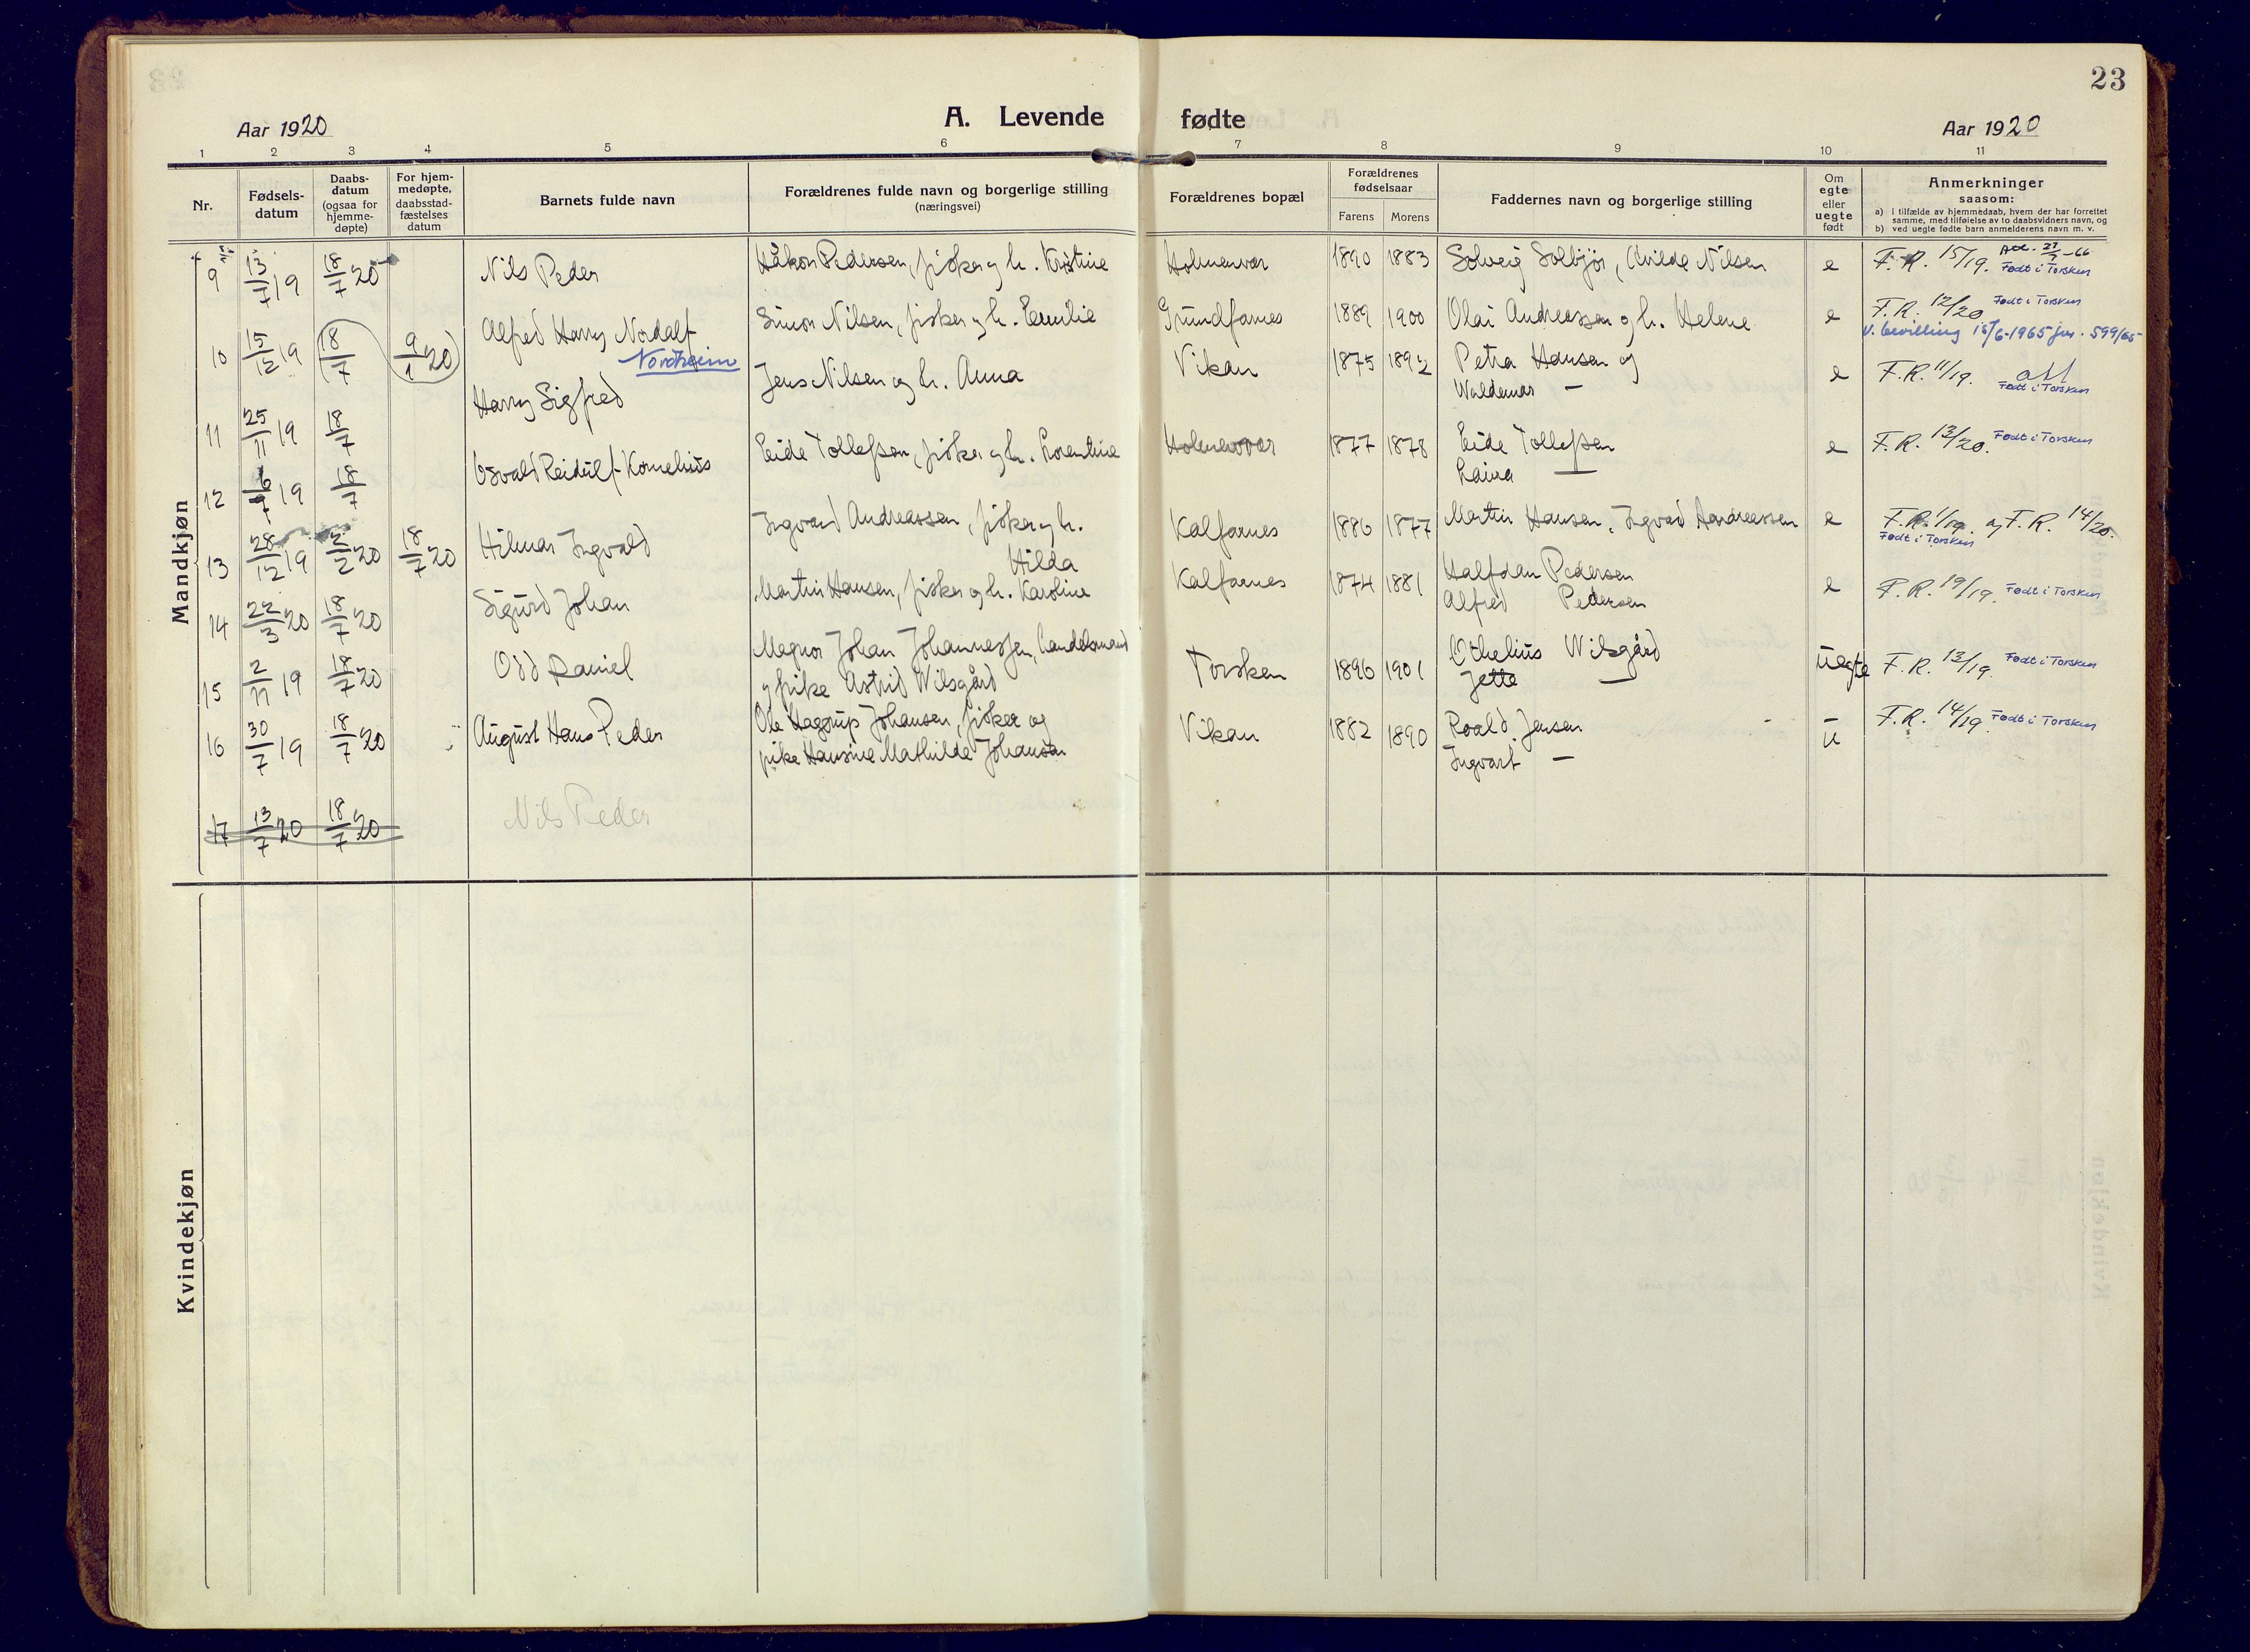 SATØ, Mefjord/Berg sokneprestkontor, G/Ga/Gaa: Ministerialbok nr. 10, 1916-1928, s. 23